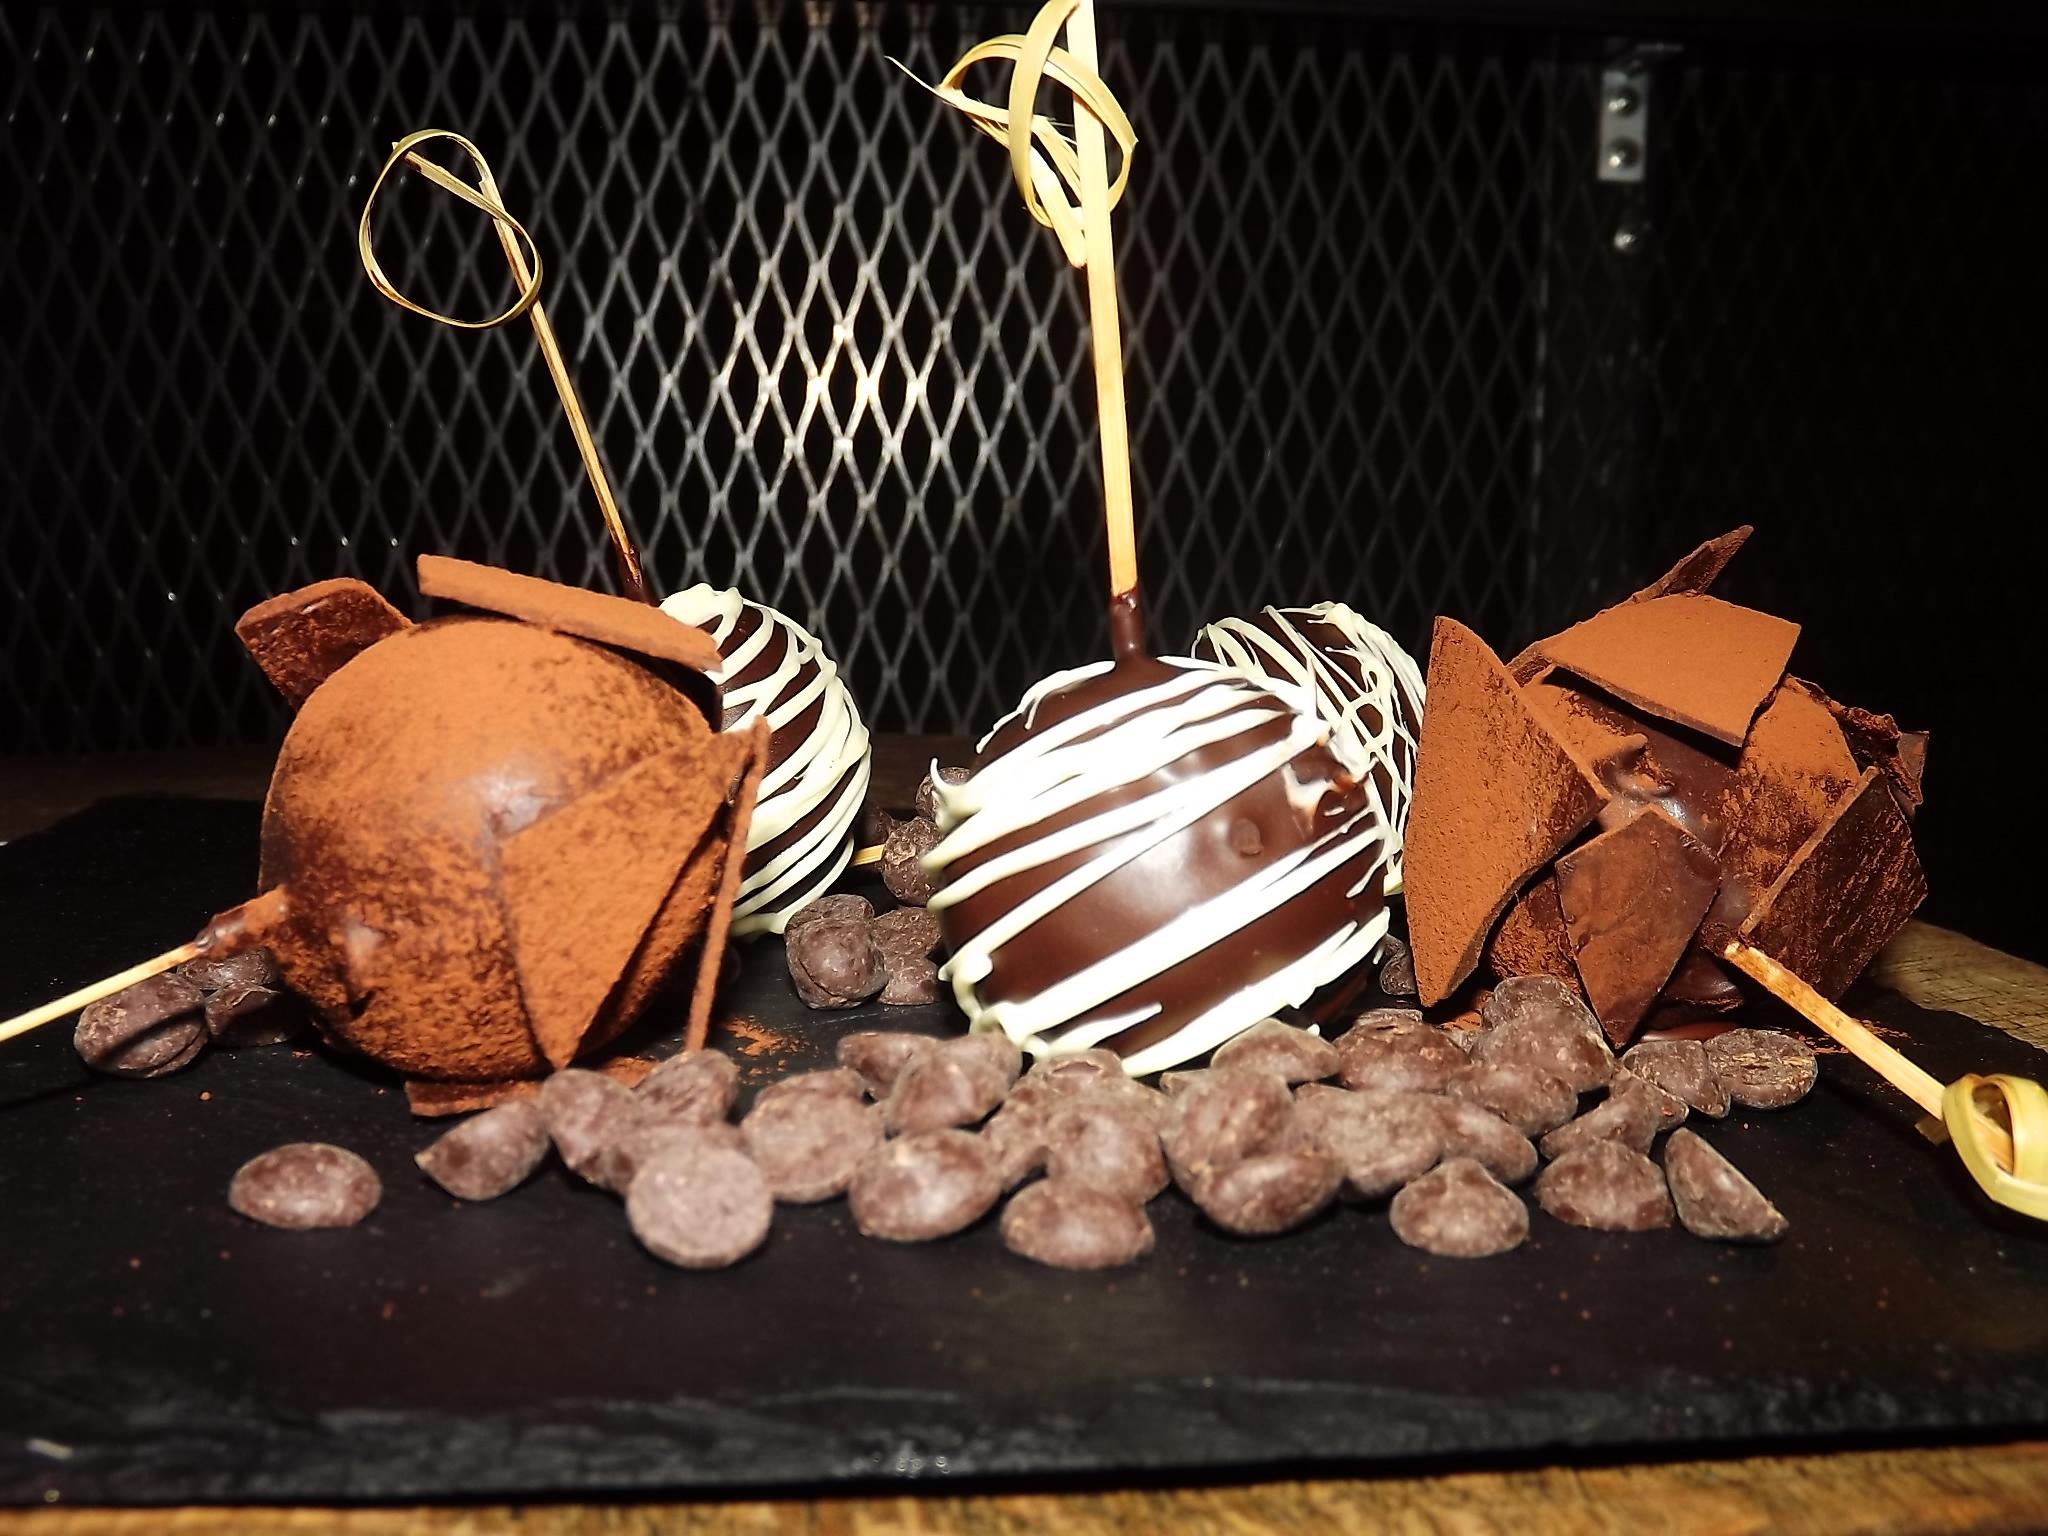 Foxcroft & Ginger Beetroot & Chocolate Cake Pops 2.jpg